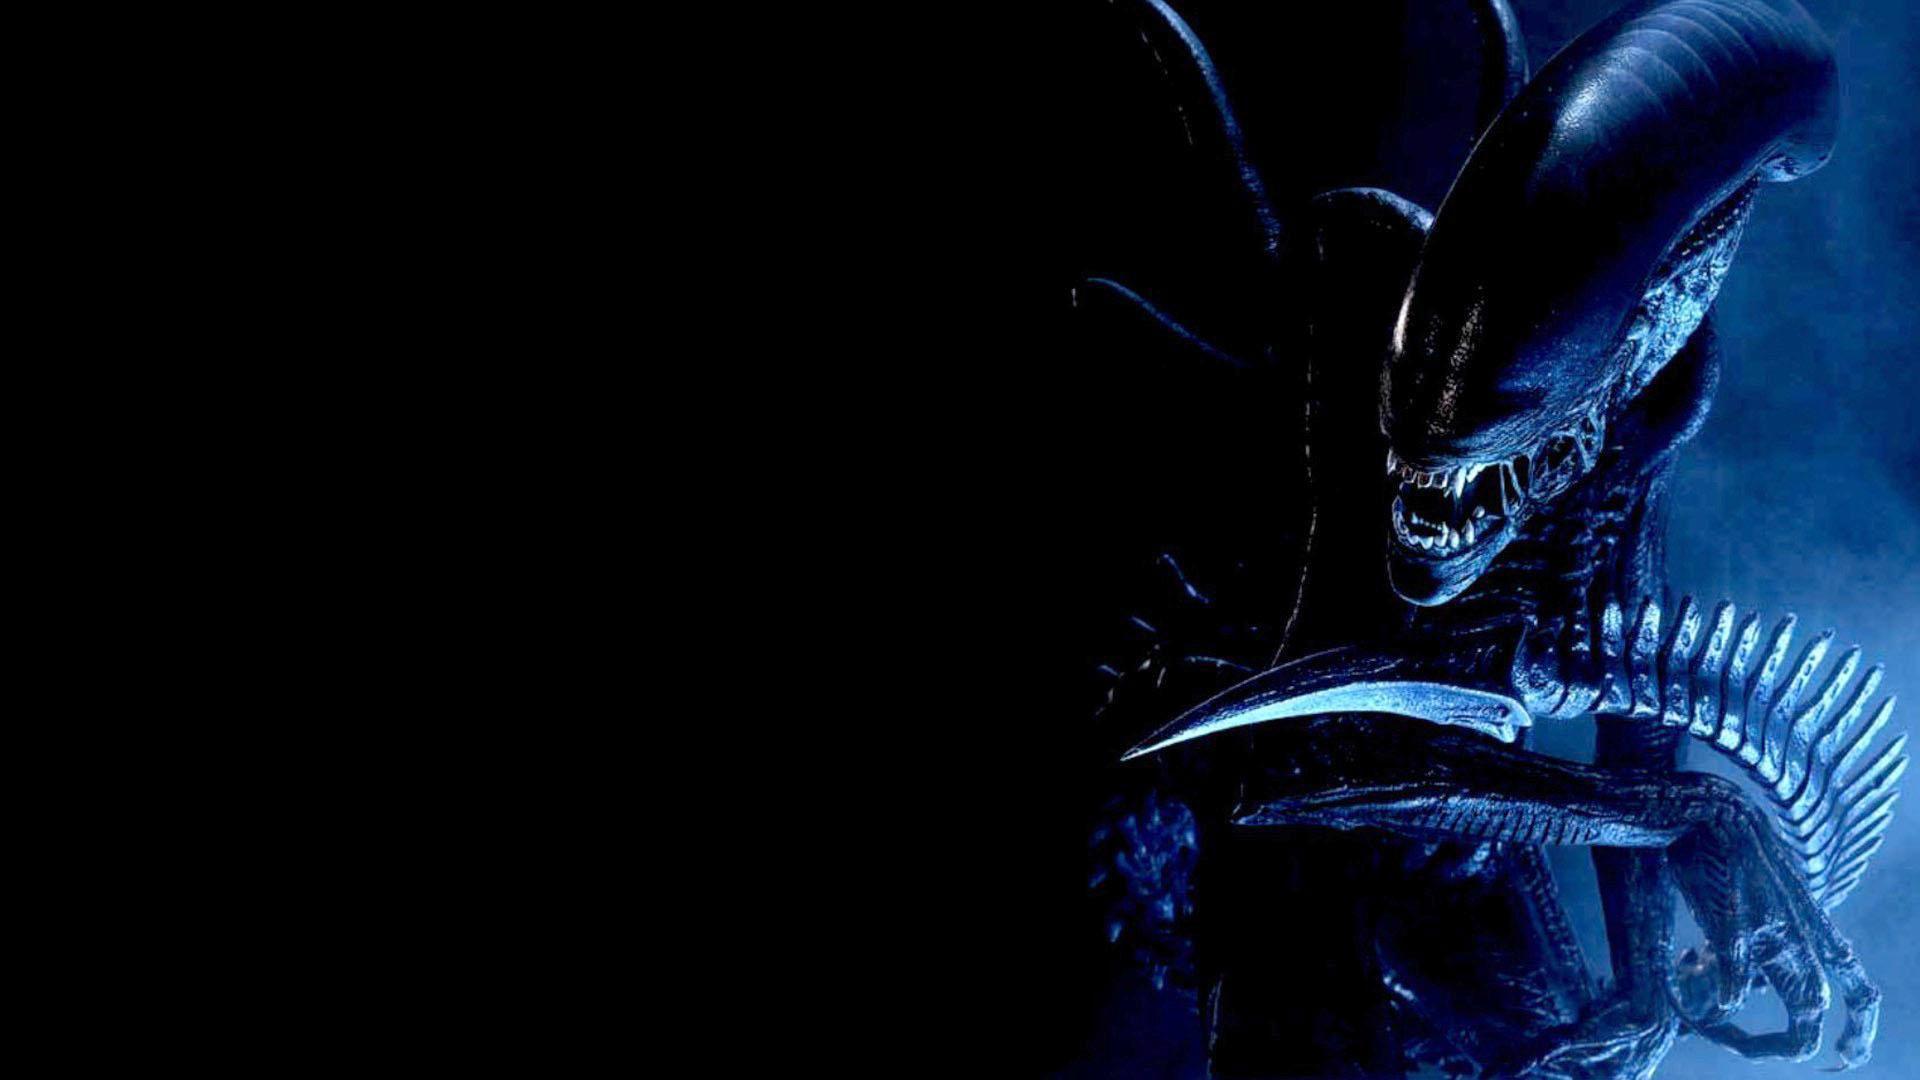 Black background Alien movie Aliens HD Wallpapers Desktop 1920x1080